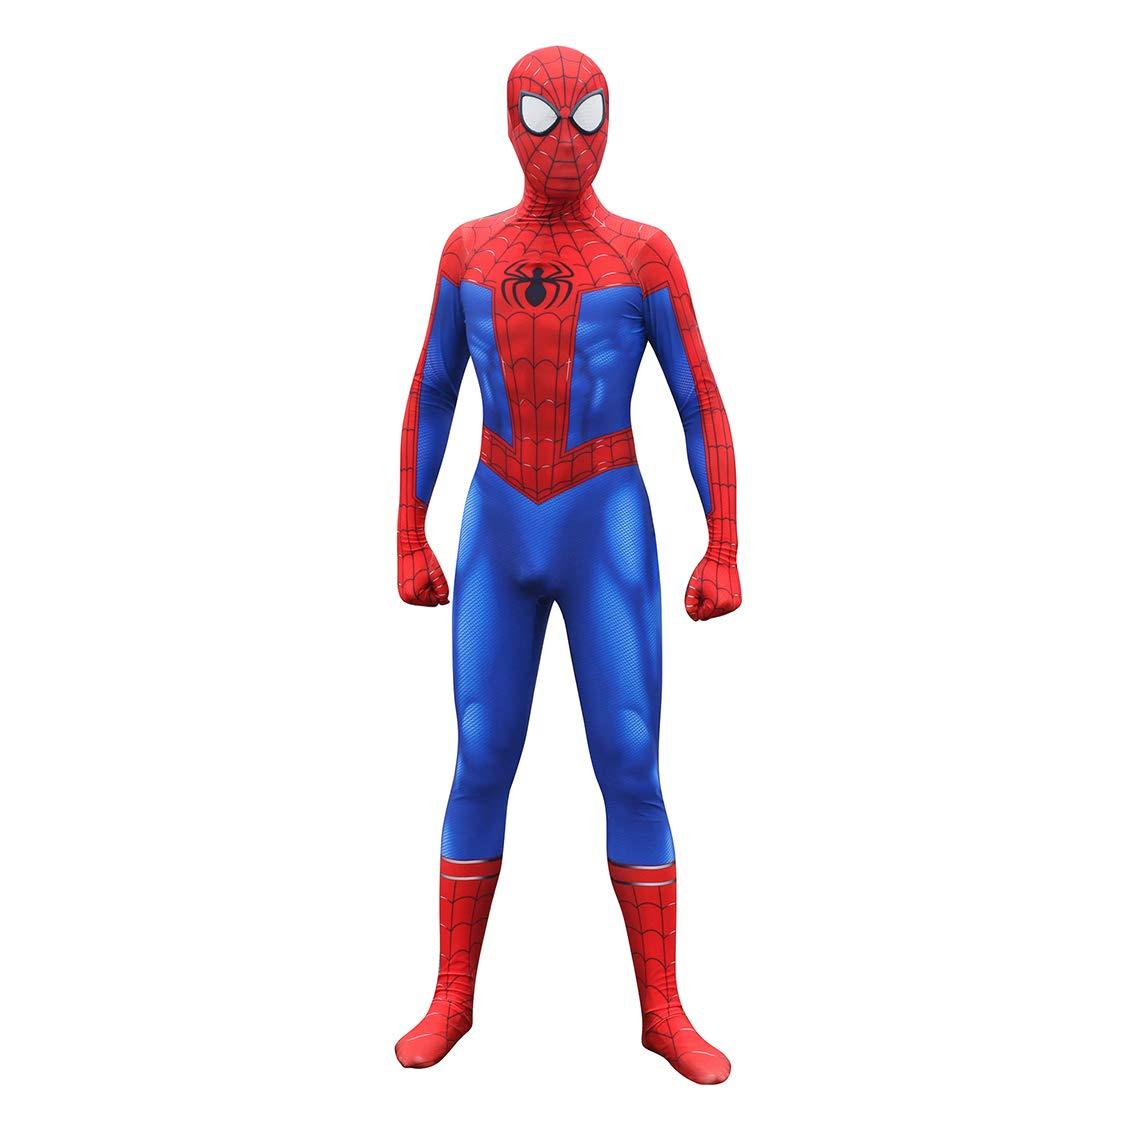 MYanimec Unisex Lycra Spandex Halloween New into The Spider Verse Miles Morales Cosplay Costumes Adult/Kids 3D Style Kids-S Blue by MYanimec